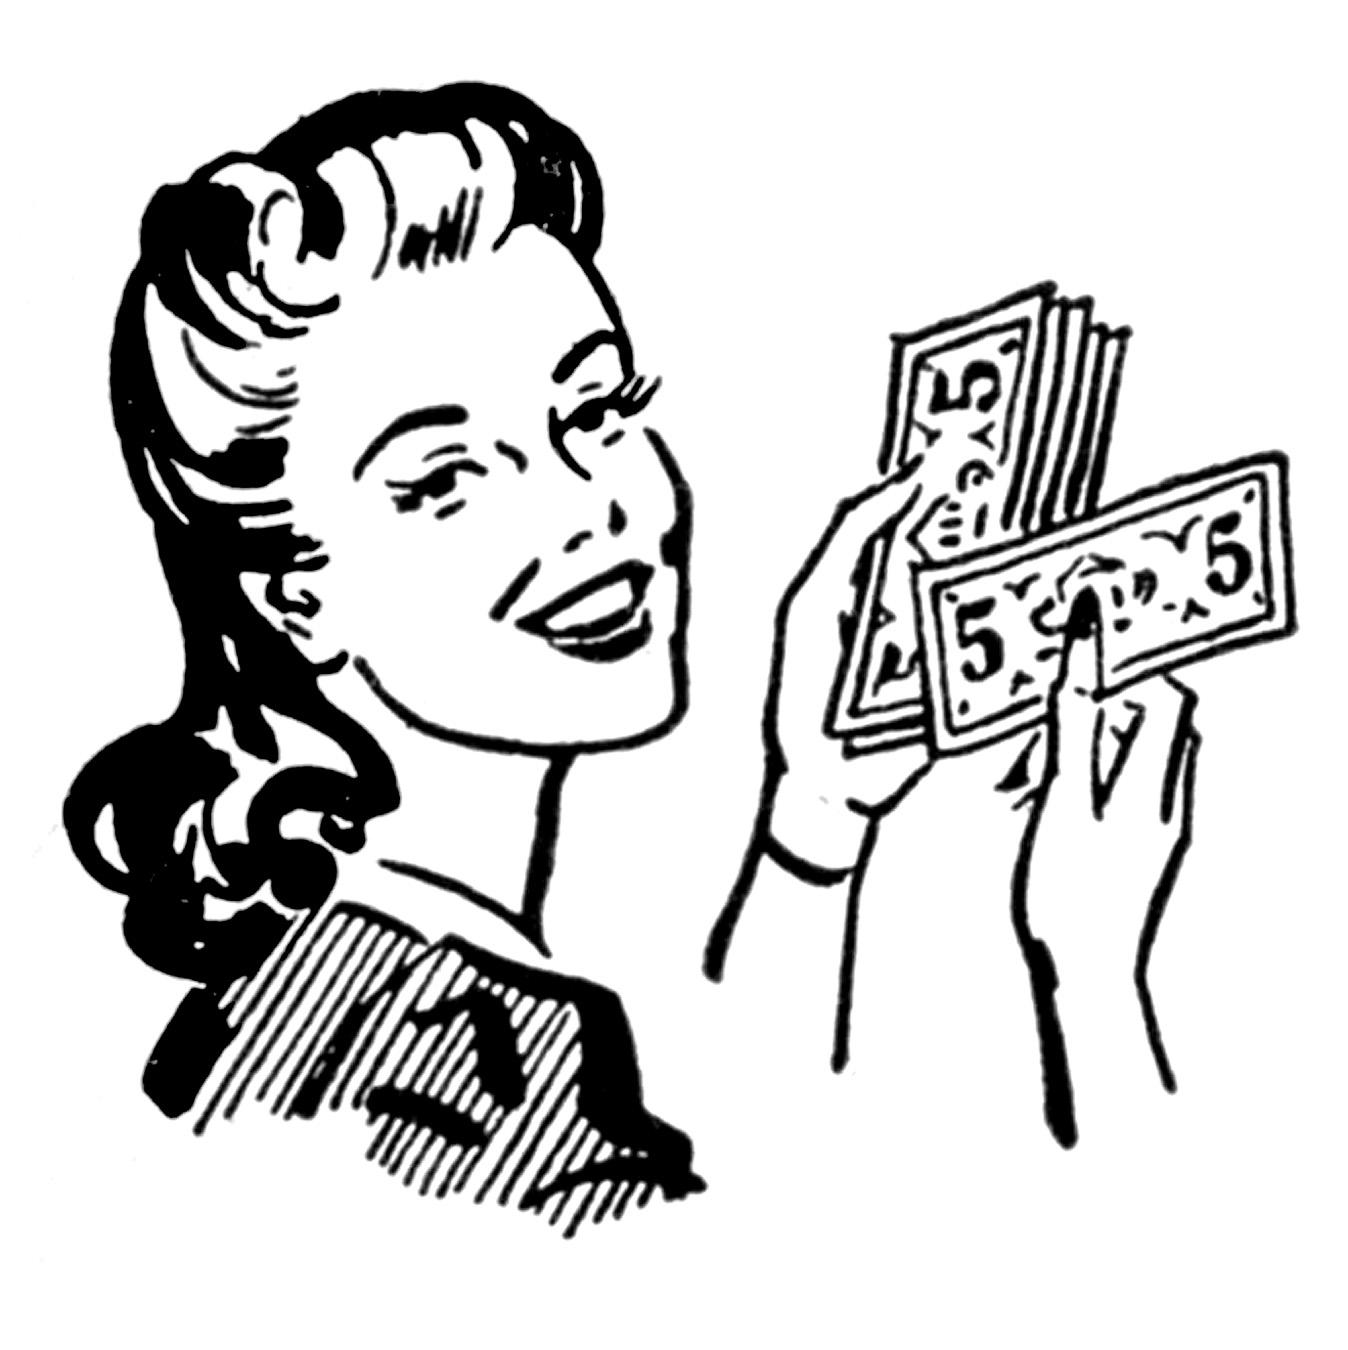 Money clip art retro. Moms women the graphics